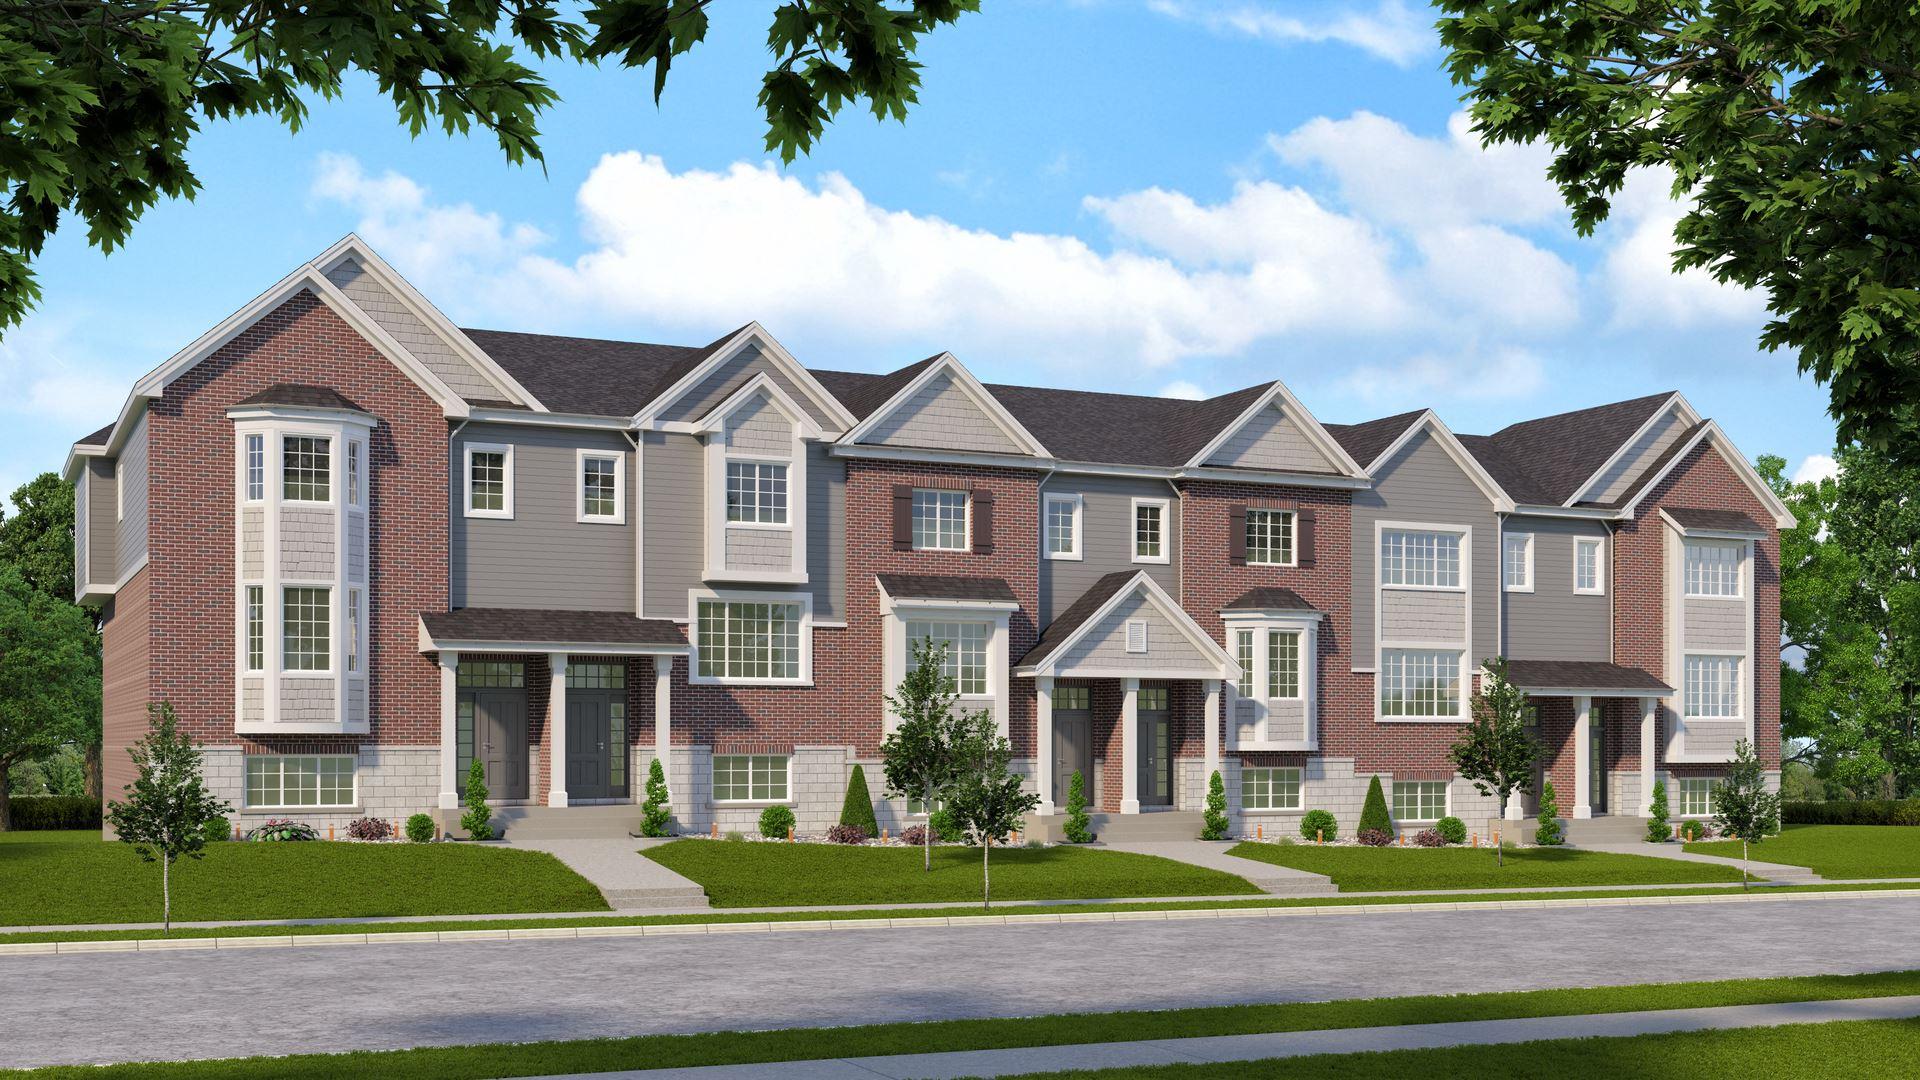 408 North Cass Avenue #5, Westmont, IL 60559 - #: 10575667